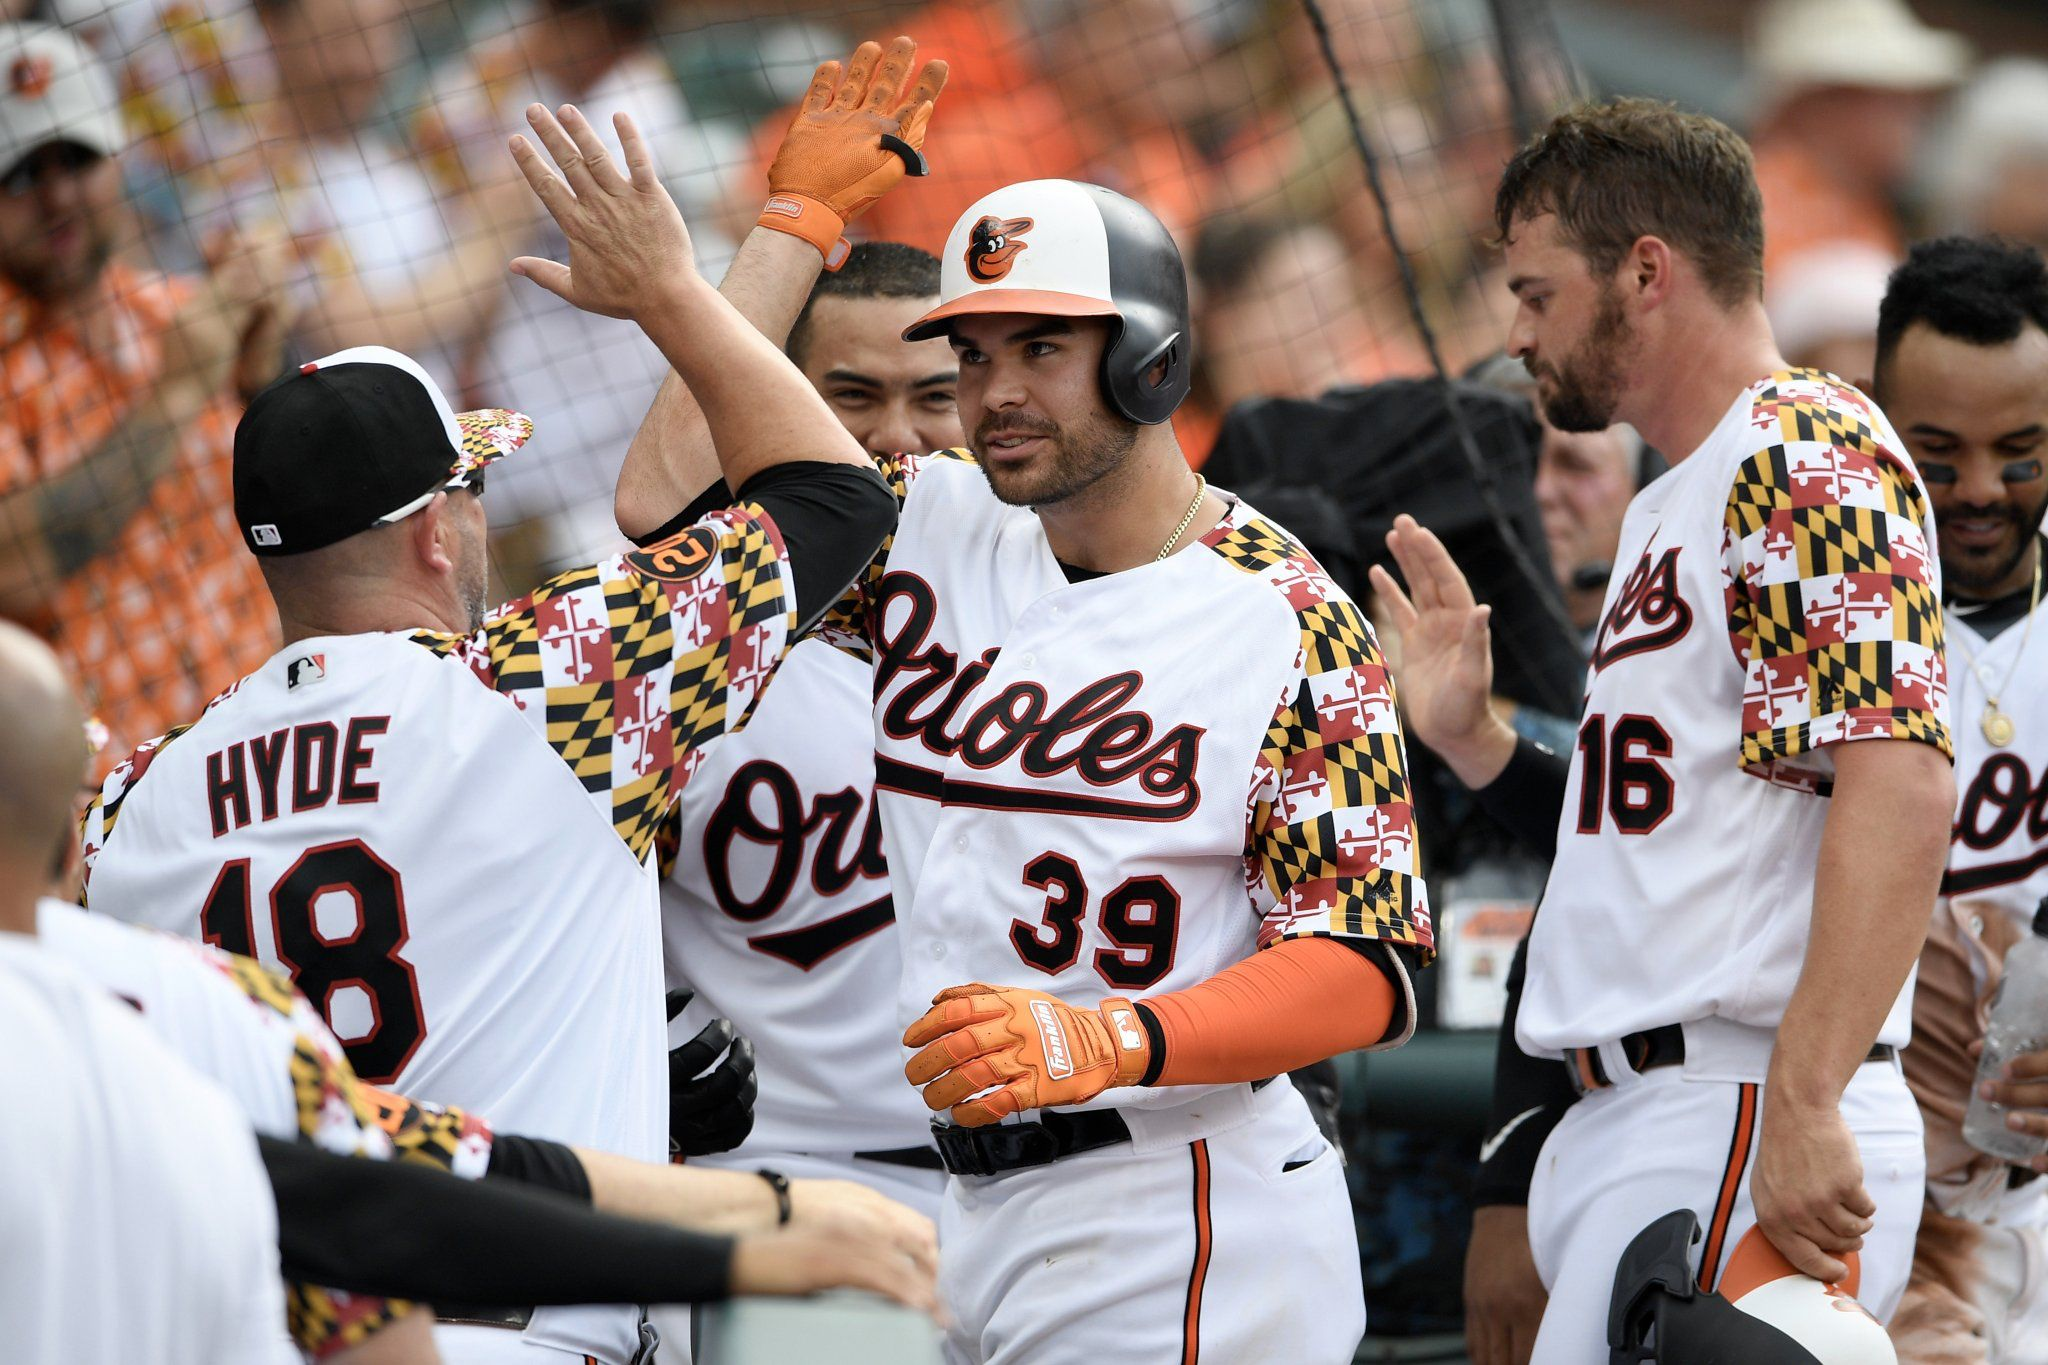 Pin By Nikki Denney On Dc Fab Baltimore Orioles Baseball Orioles Baseball Baltimore Orioles